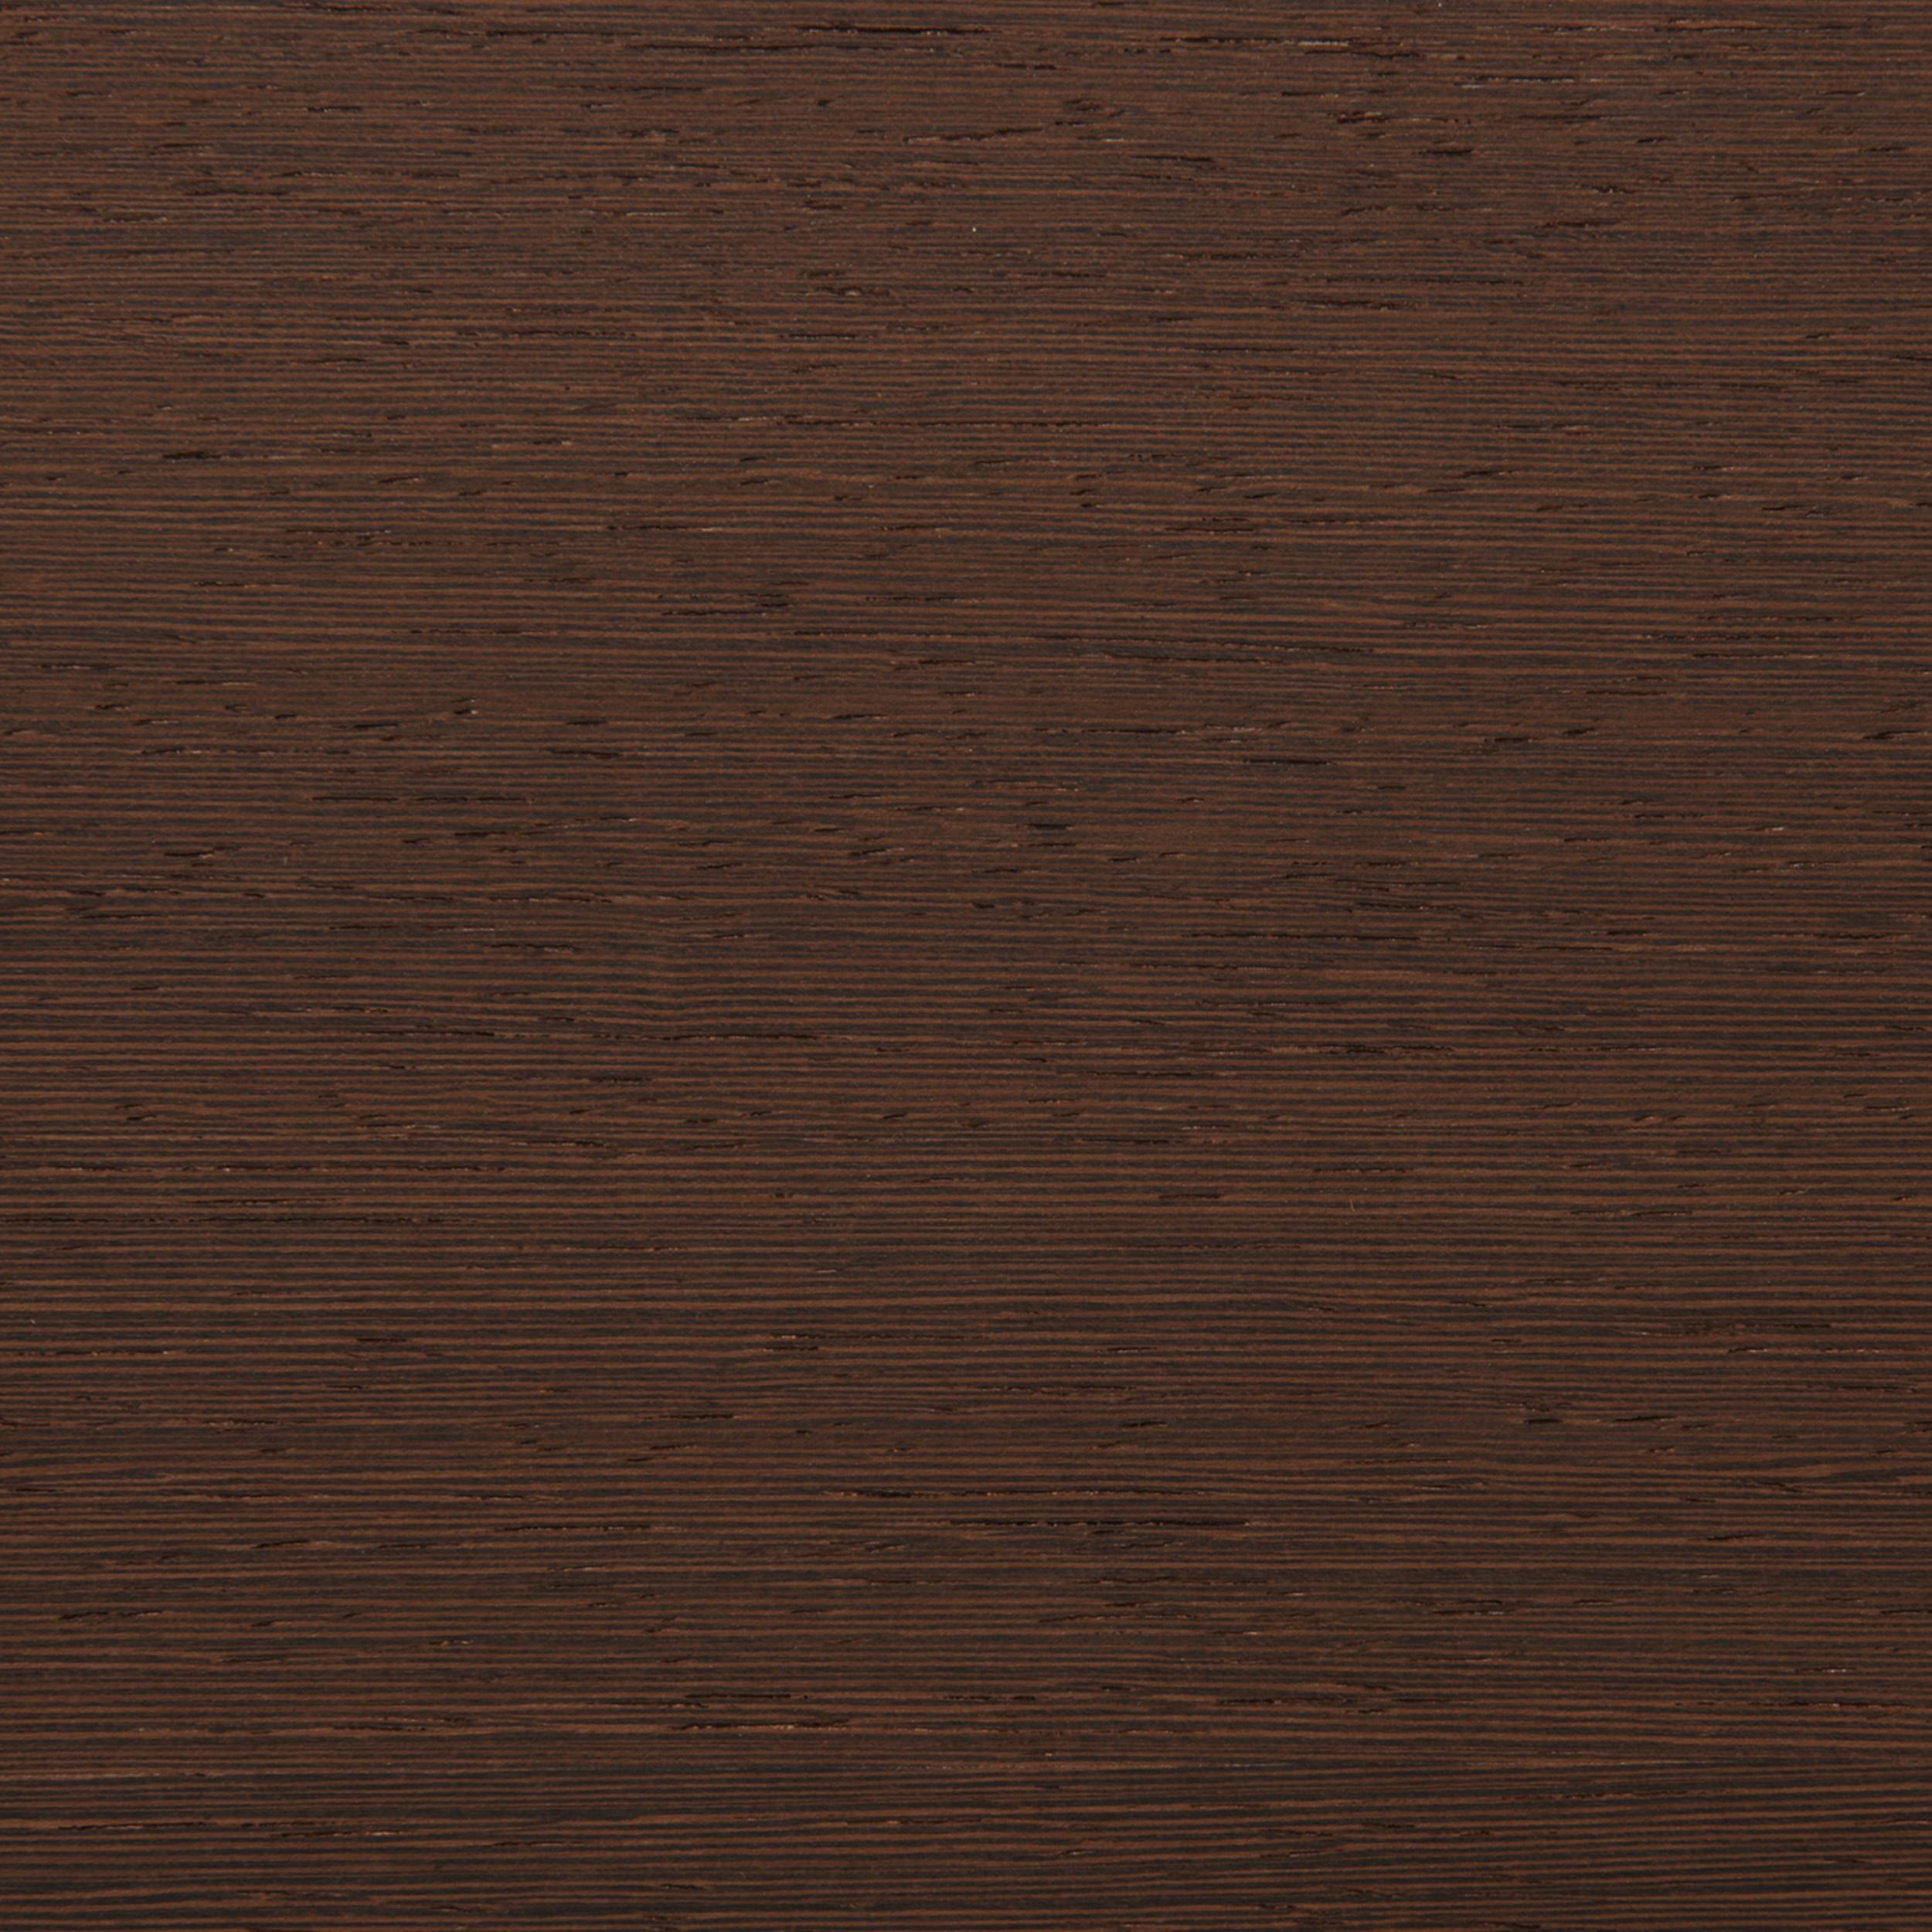 Wenge, Quartersawn 4'X8' Veneer Sheet, 3M PSA Backed